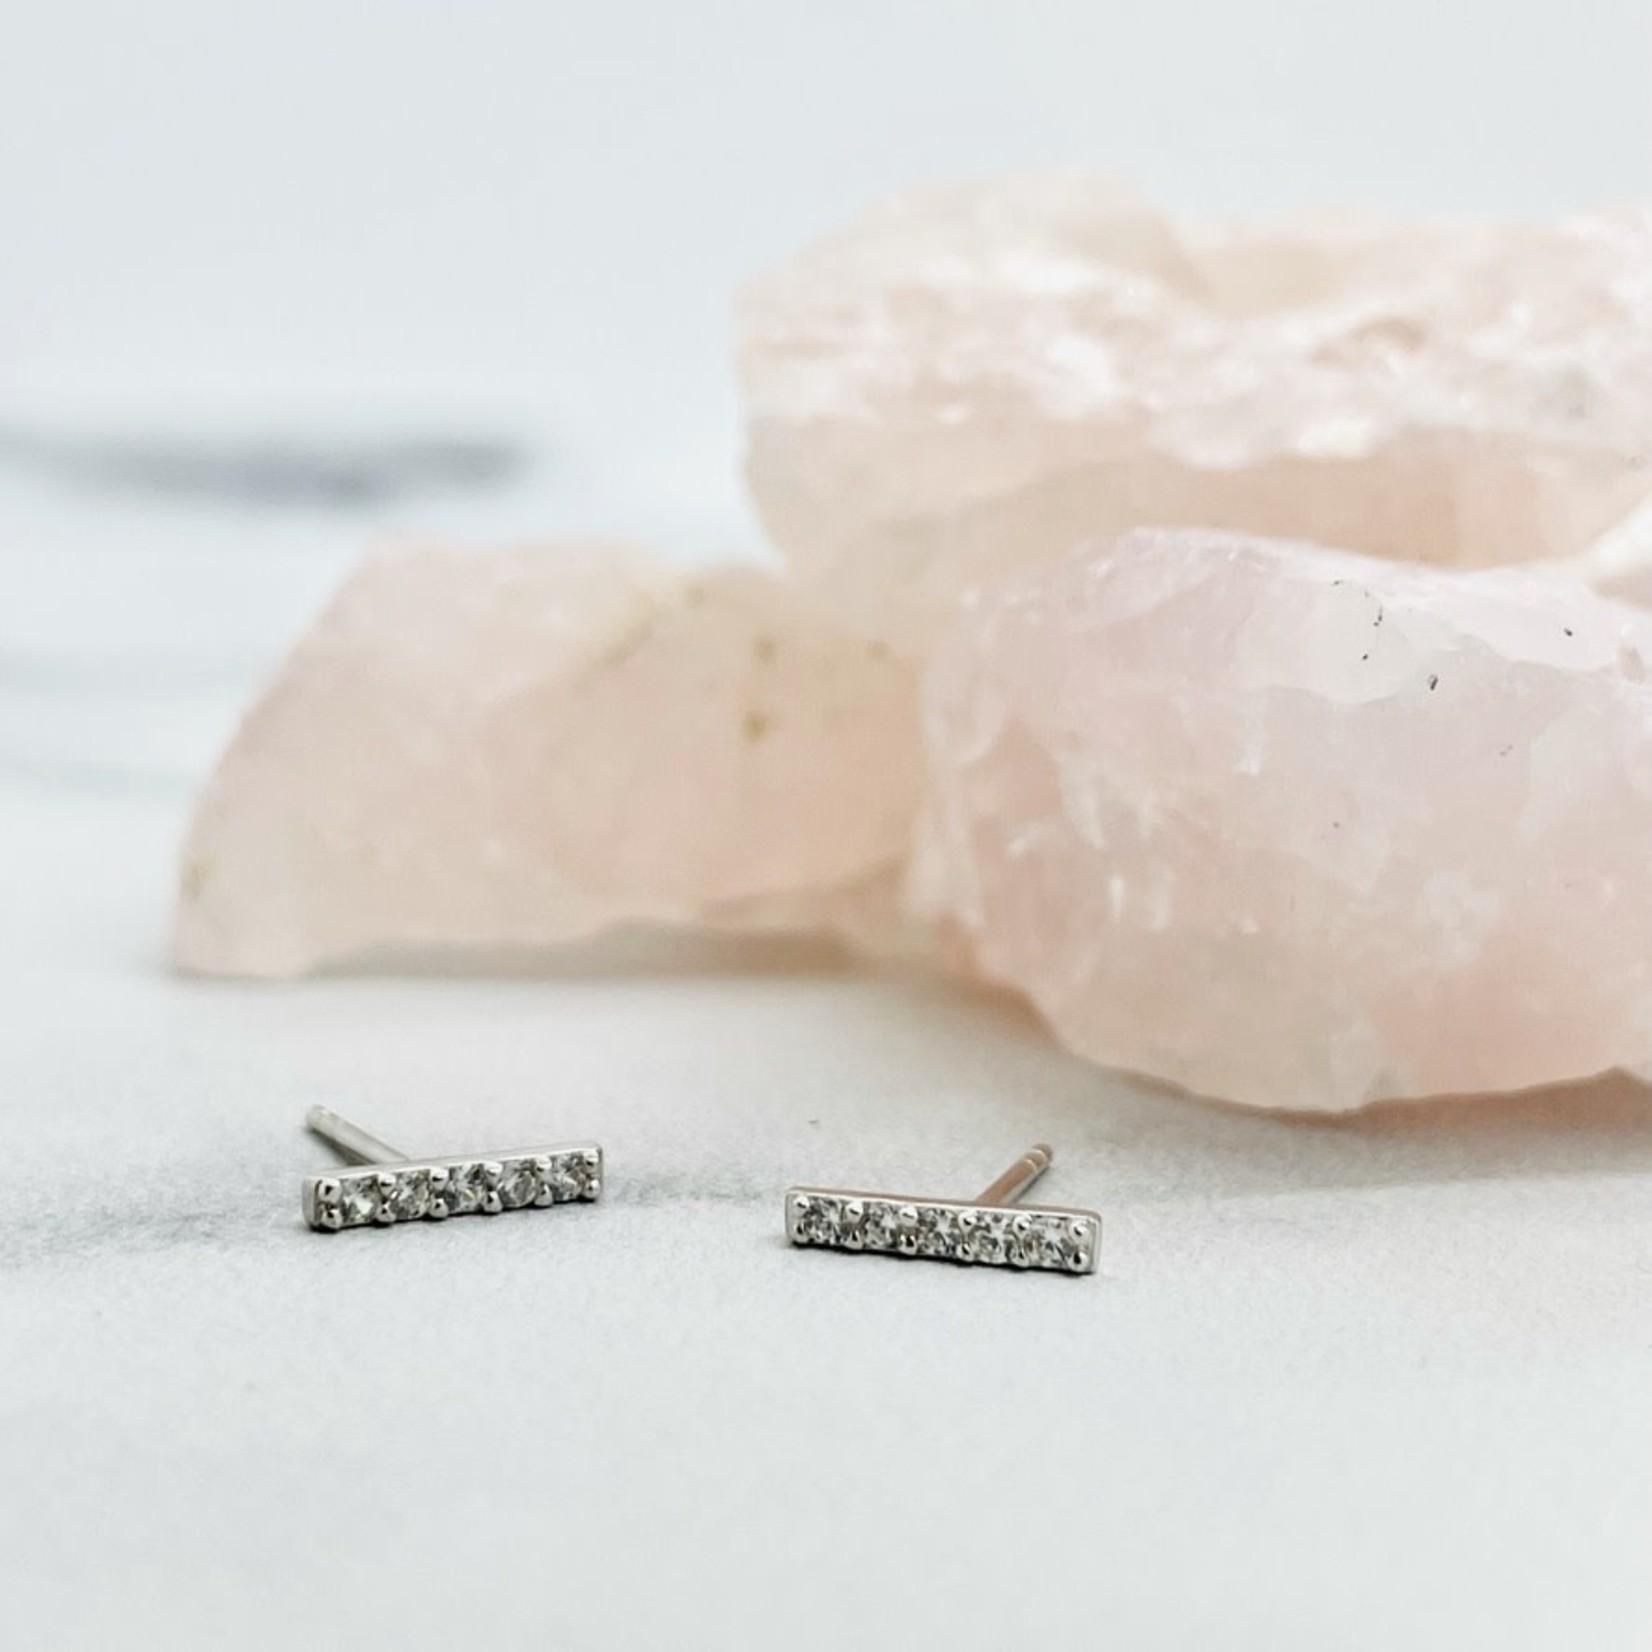 Silver and CZ Mini Bar Stud Earrings